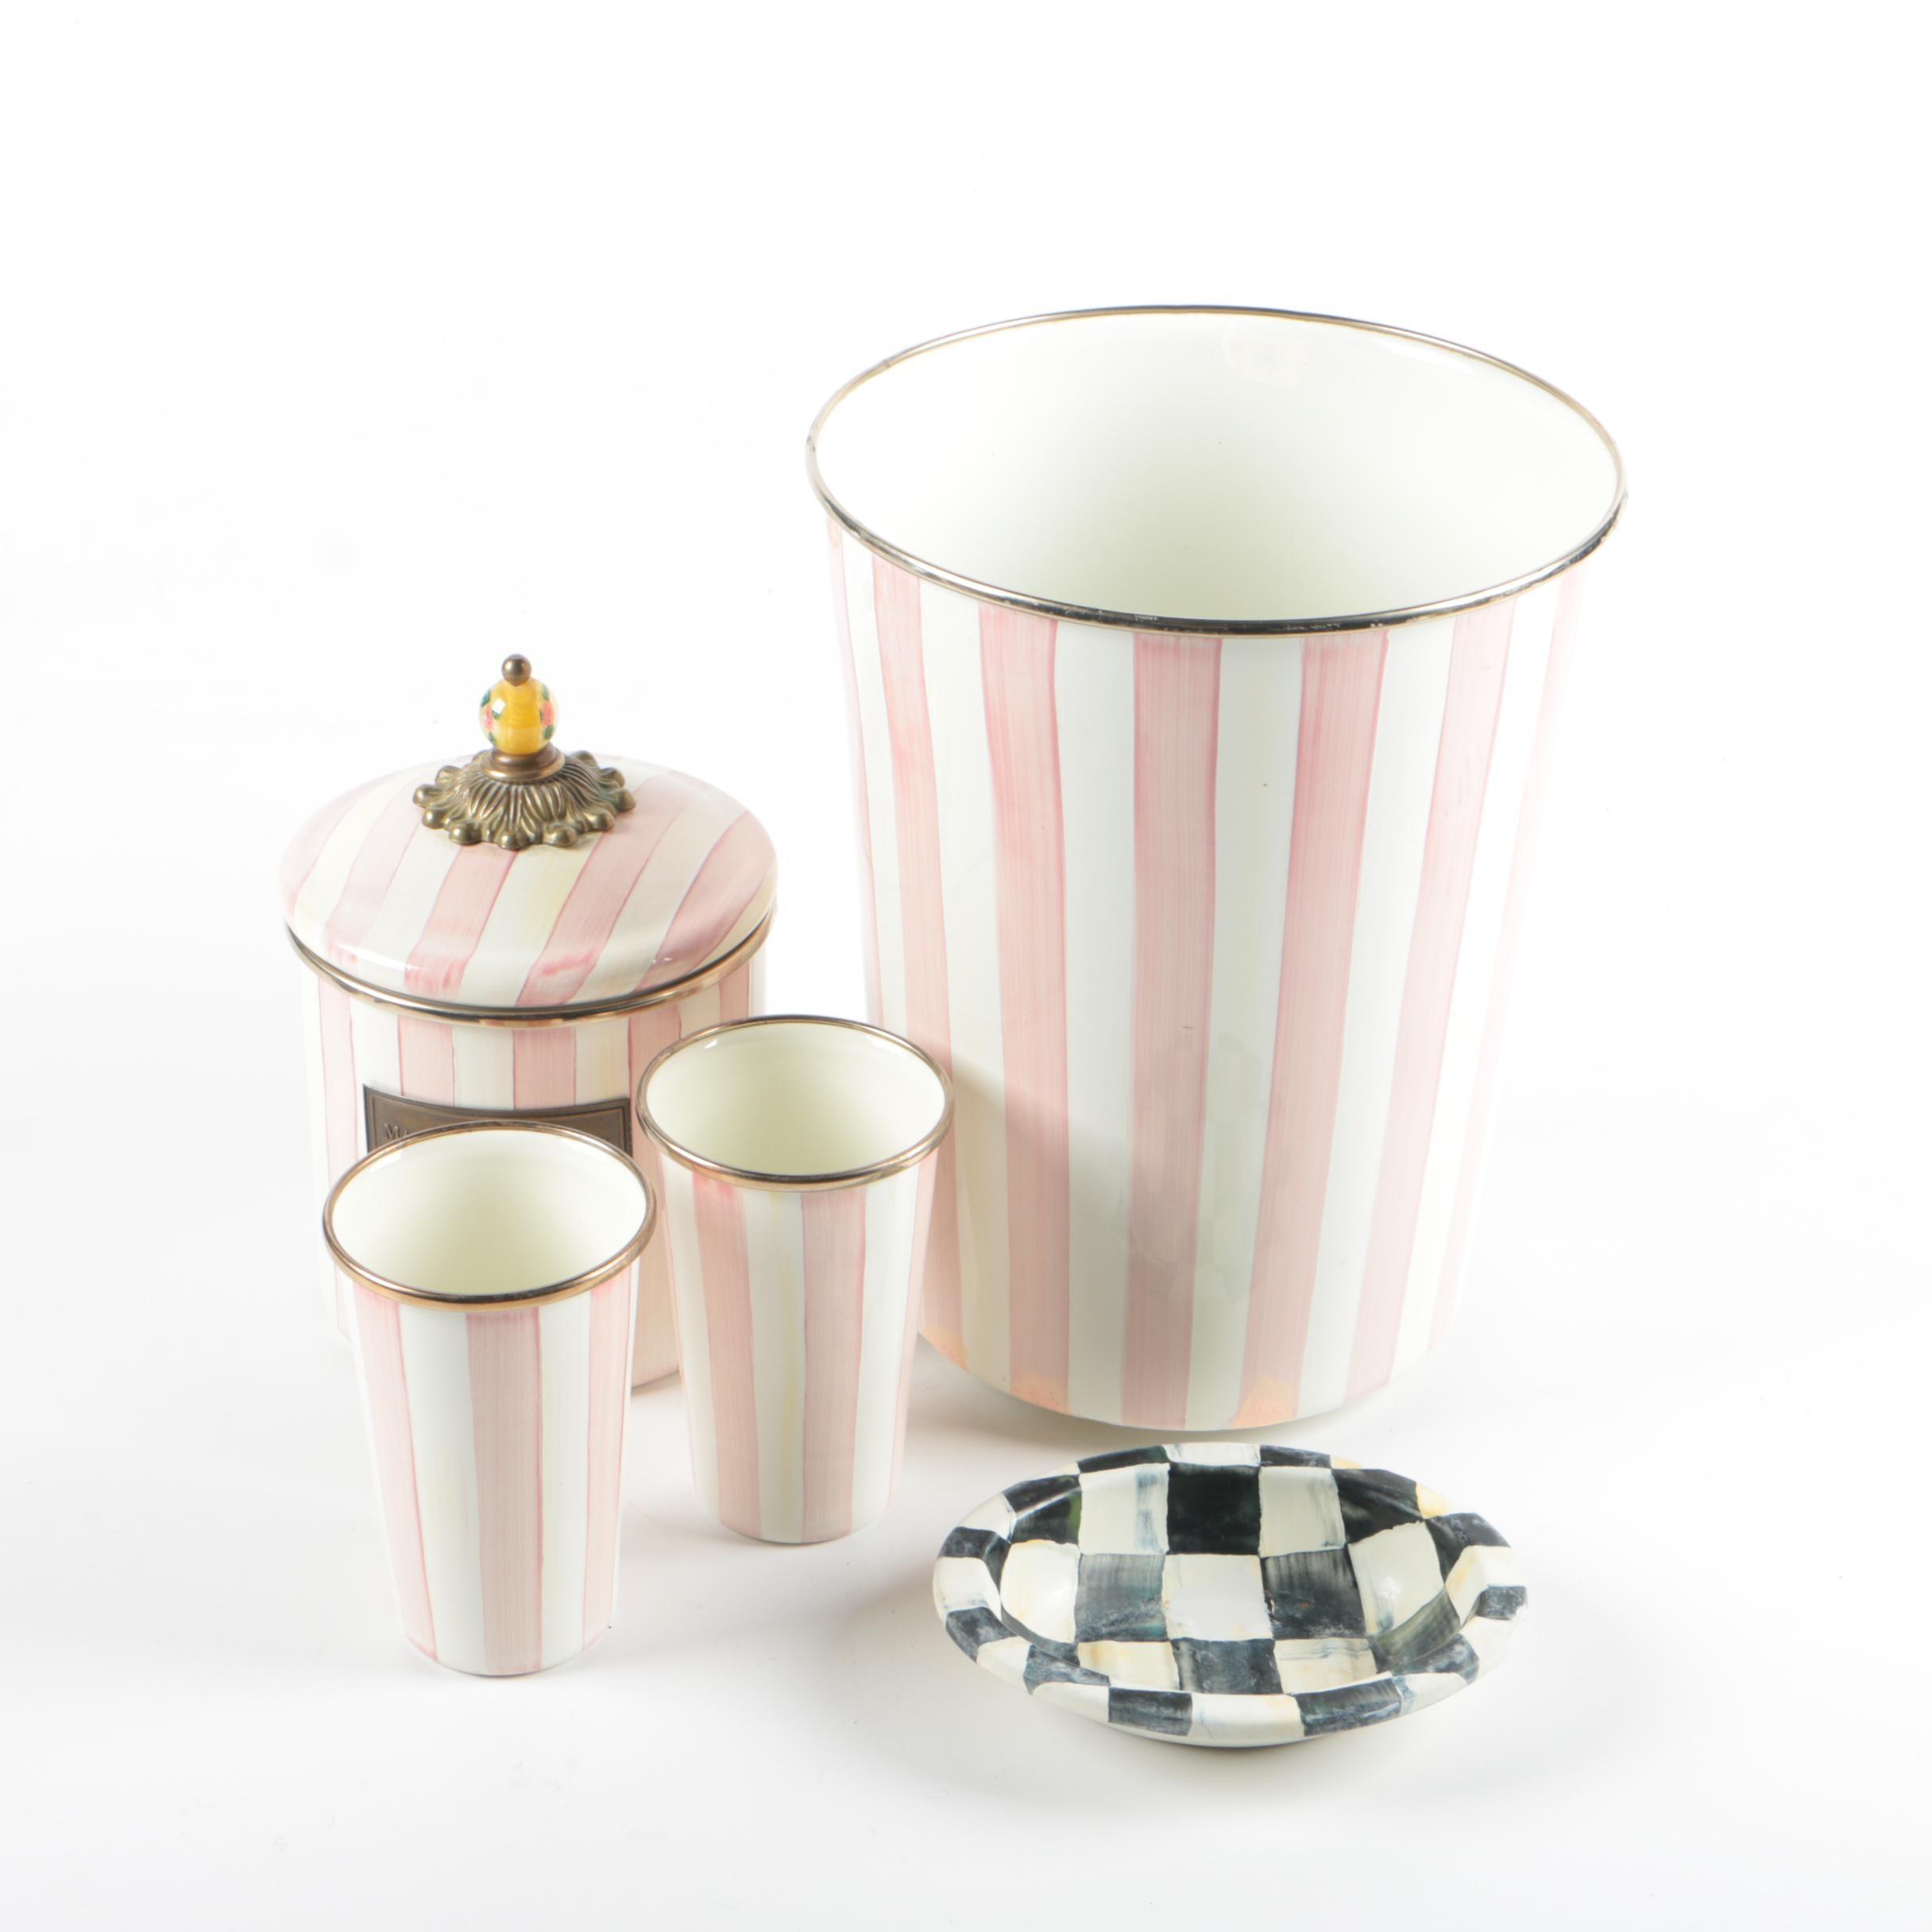 Mackenzie-Childs Ceramic Bathroom Accessories